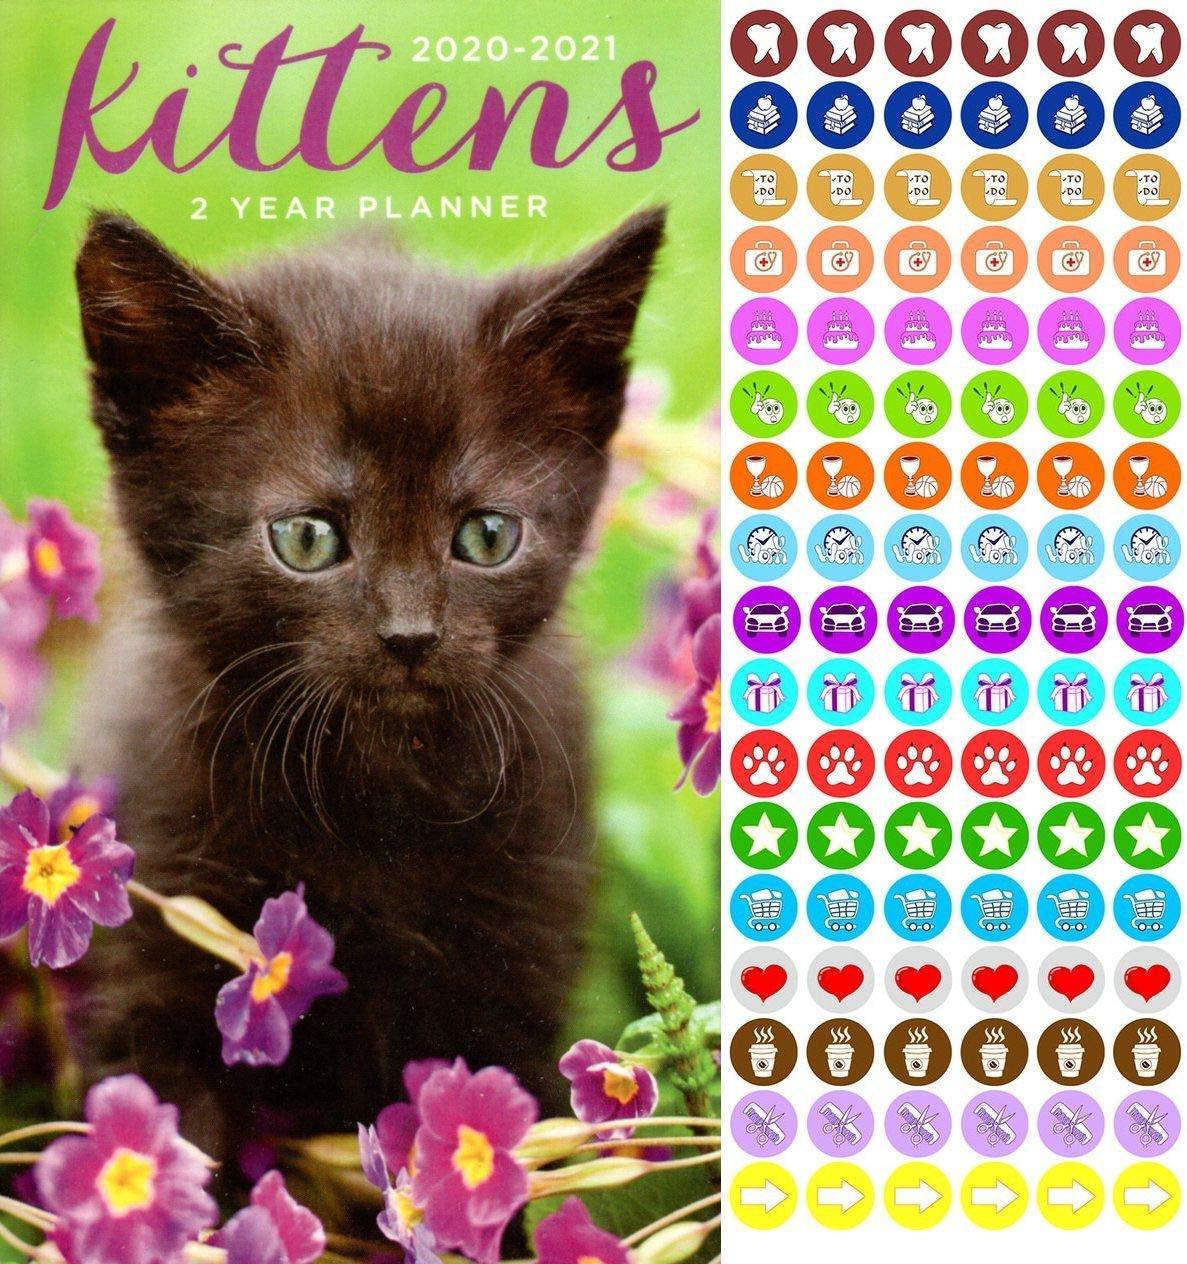 Kittens 2020-2021 2 Year Pocket Planner/Calendar/Organizer